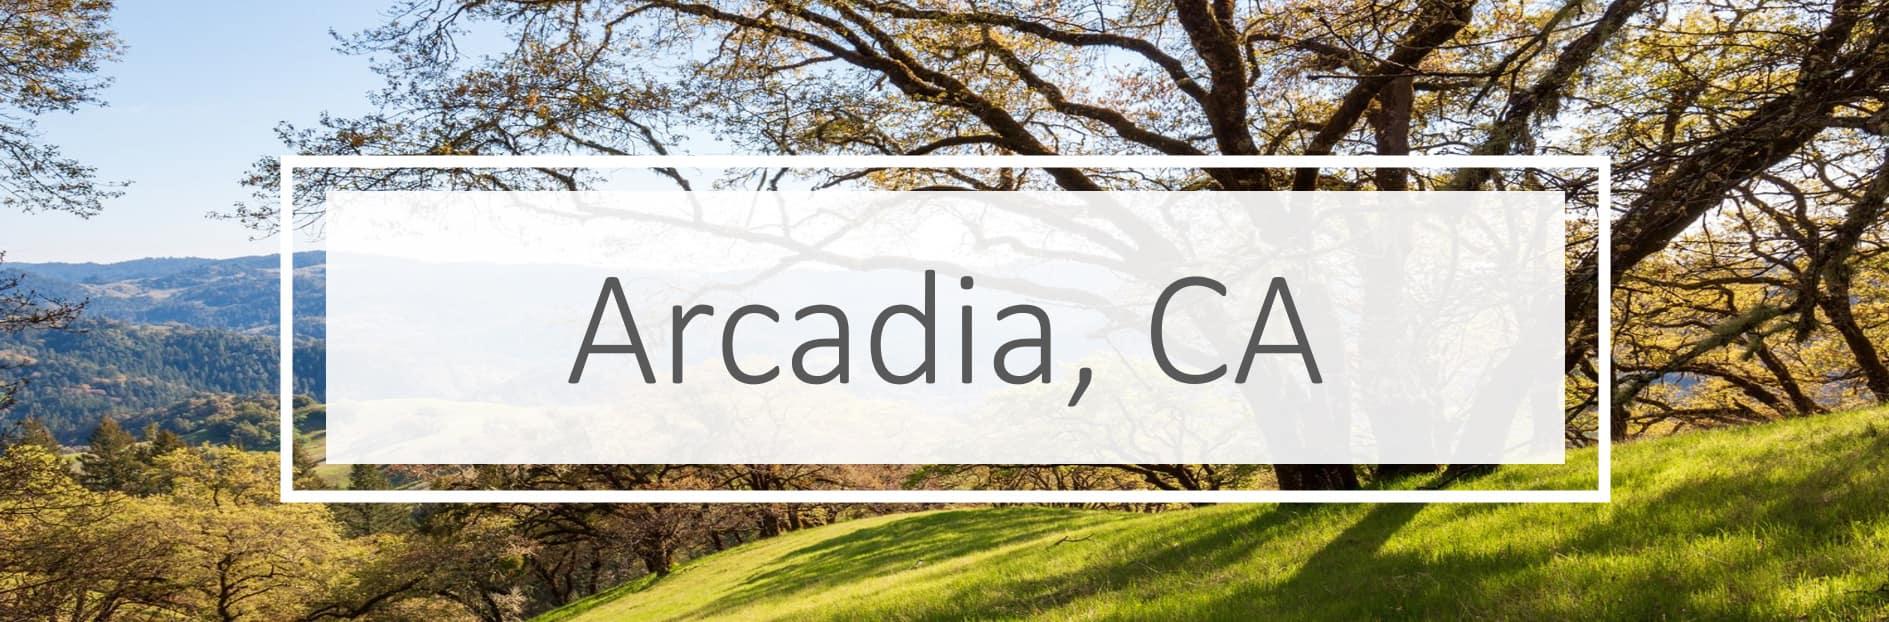 Nissan Dealer Serving Arcadia, CA